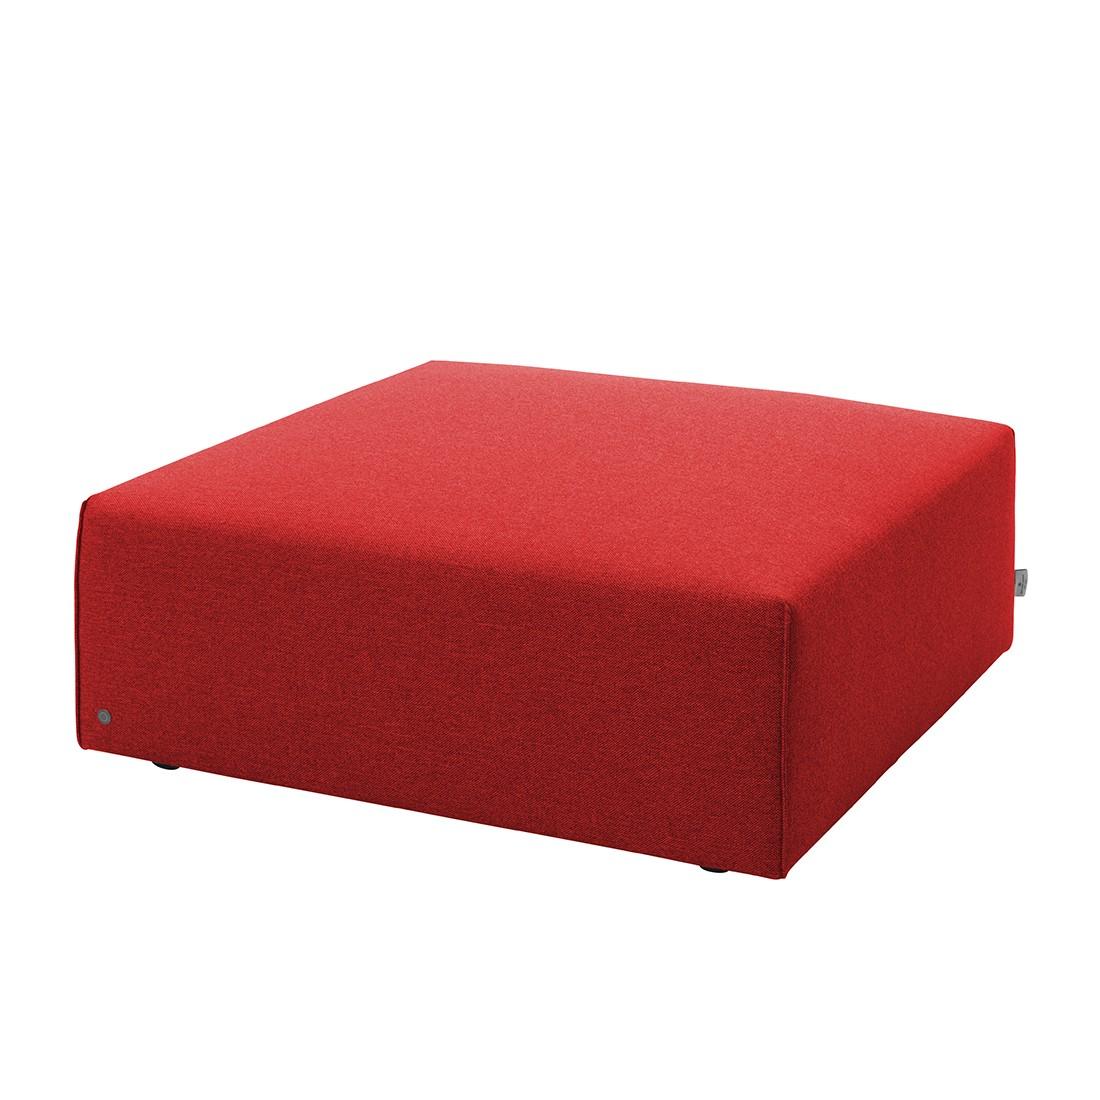 Hocker Elements – Strukturstoff – Rot, Tom Tailor günstig bestellen